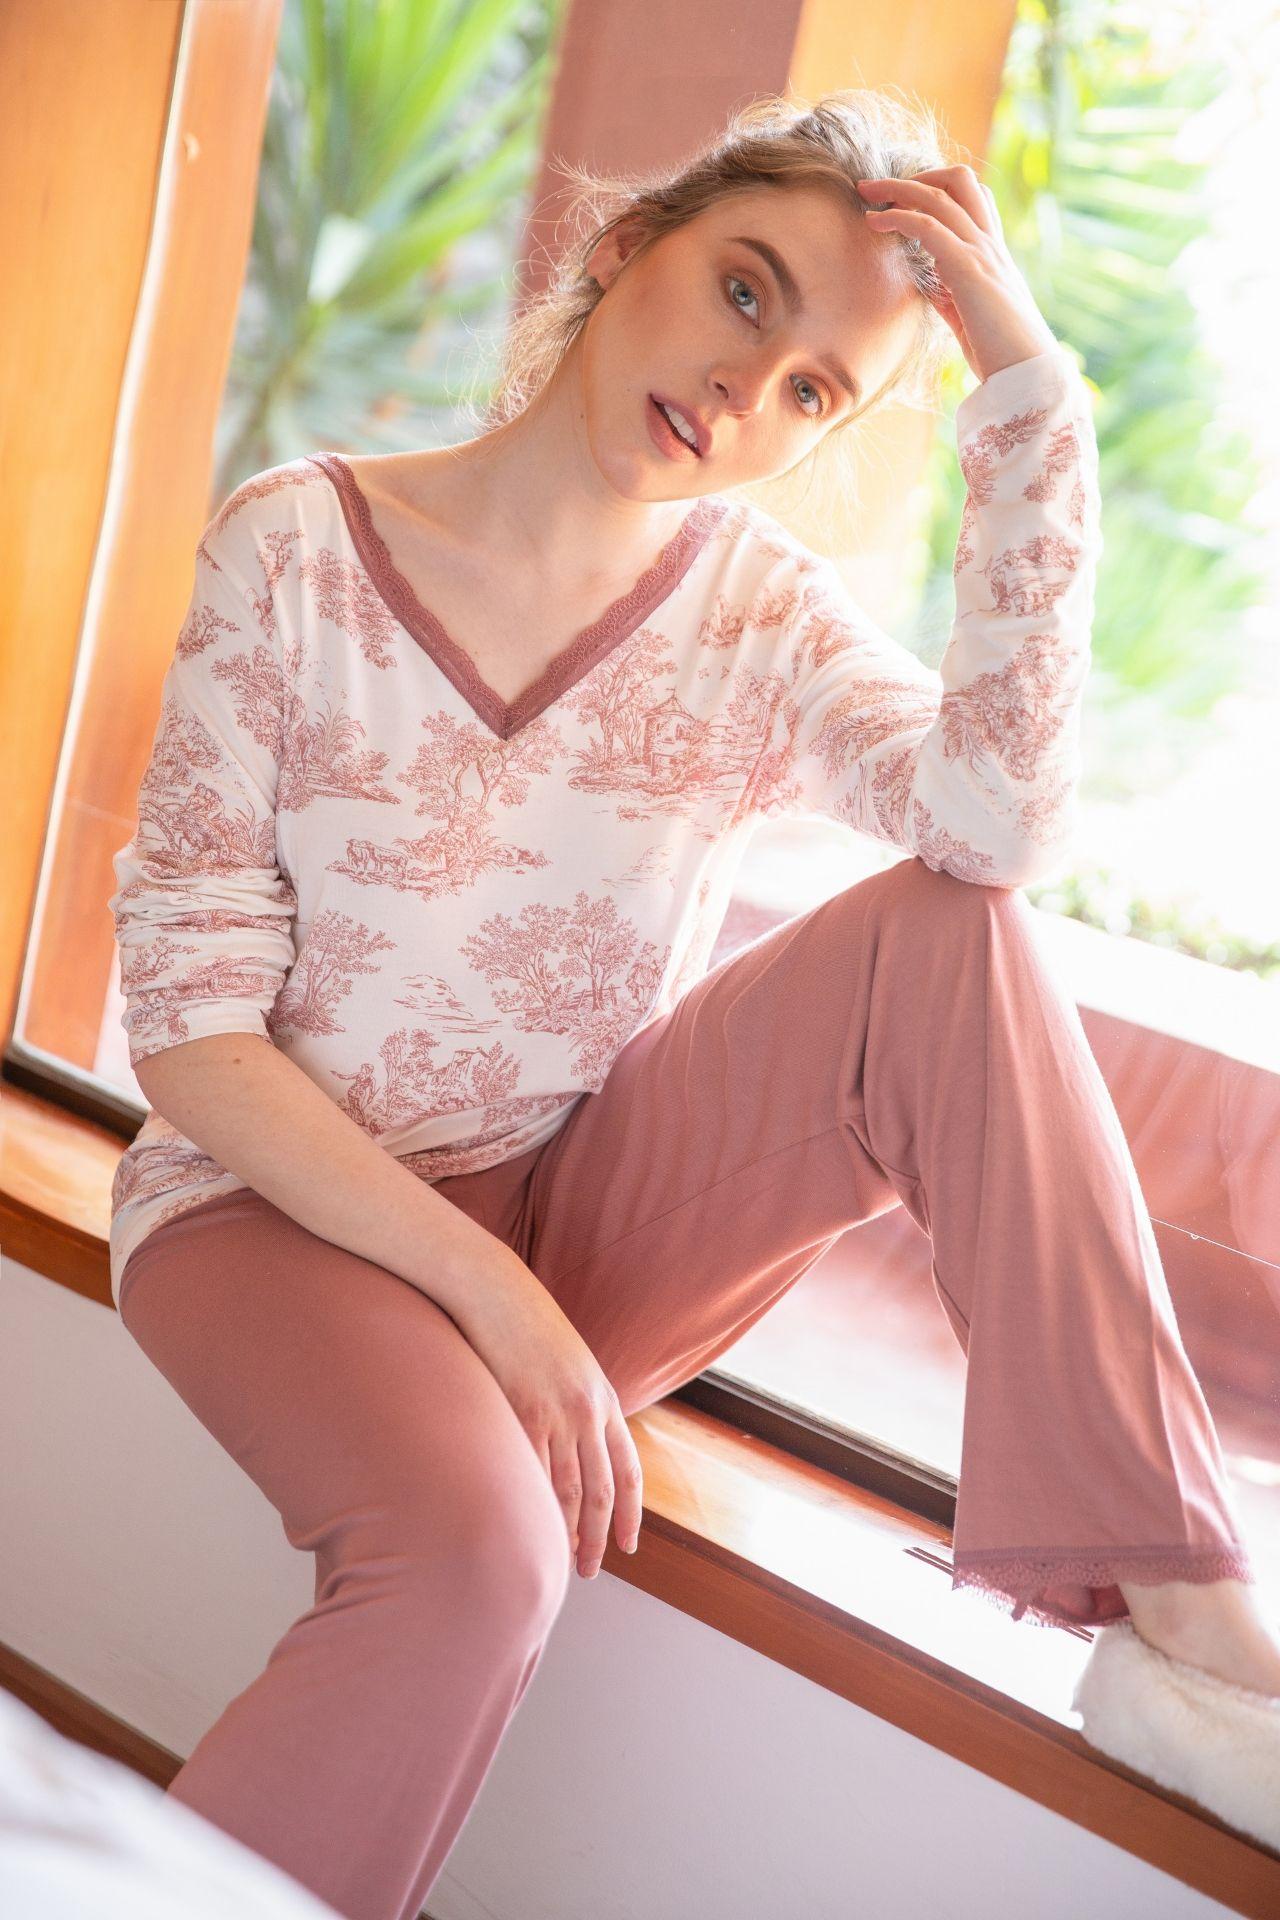 Pijama de algodón.  2 piezas pantalón y polo manga larga blondas OLD ROSA.